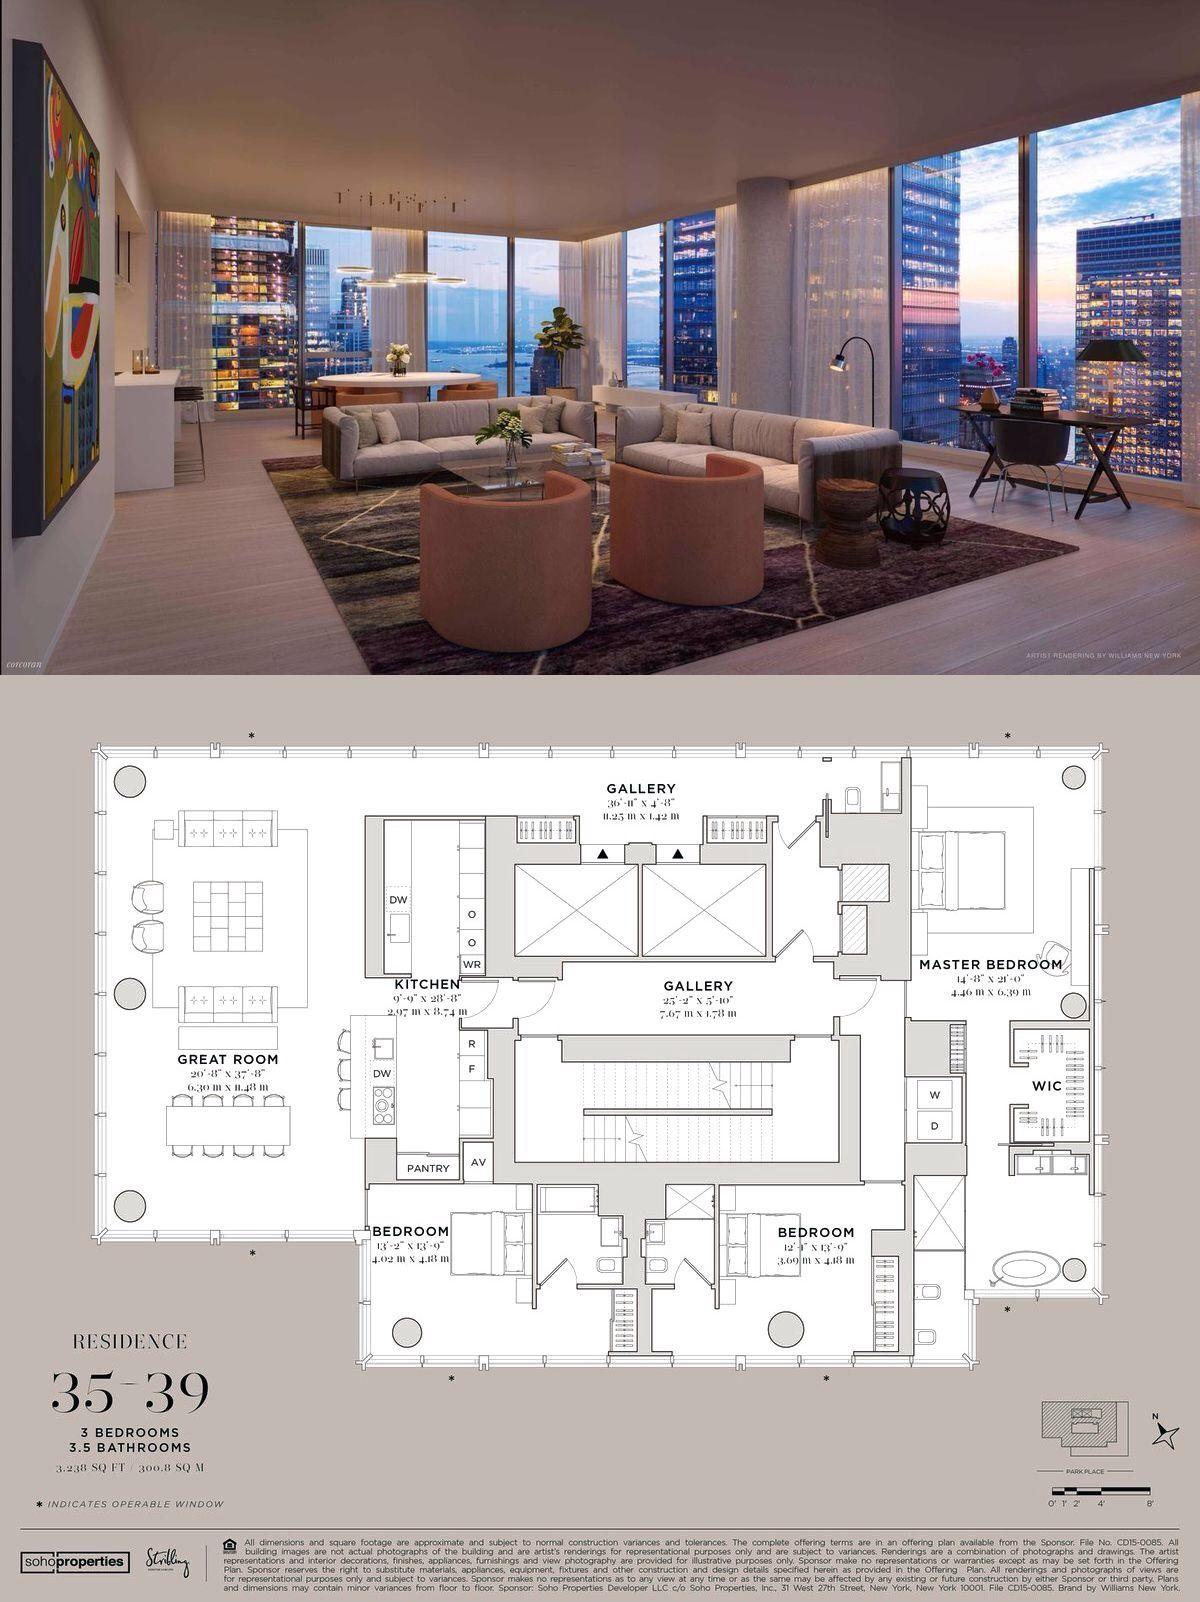 45 Park Place 35th Fl 35th Fl In Tribeca Manhattan Streeteasy Architectural Floor Plans Modern House Floor Plans Home Building Design